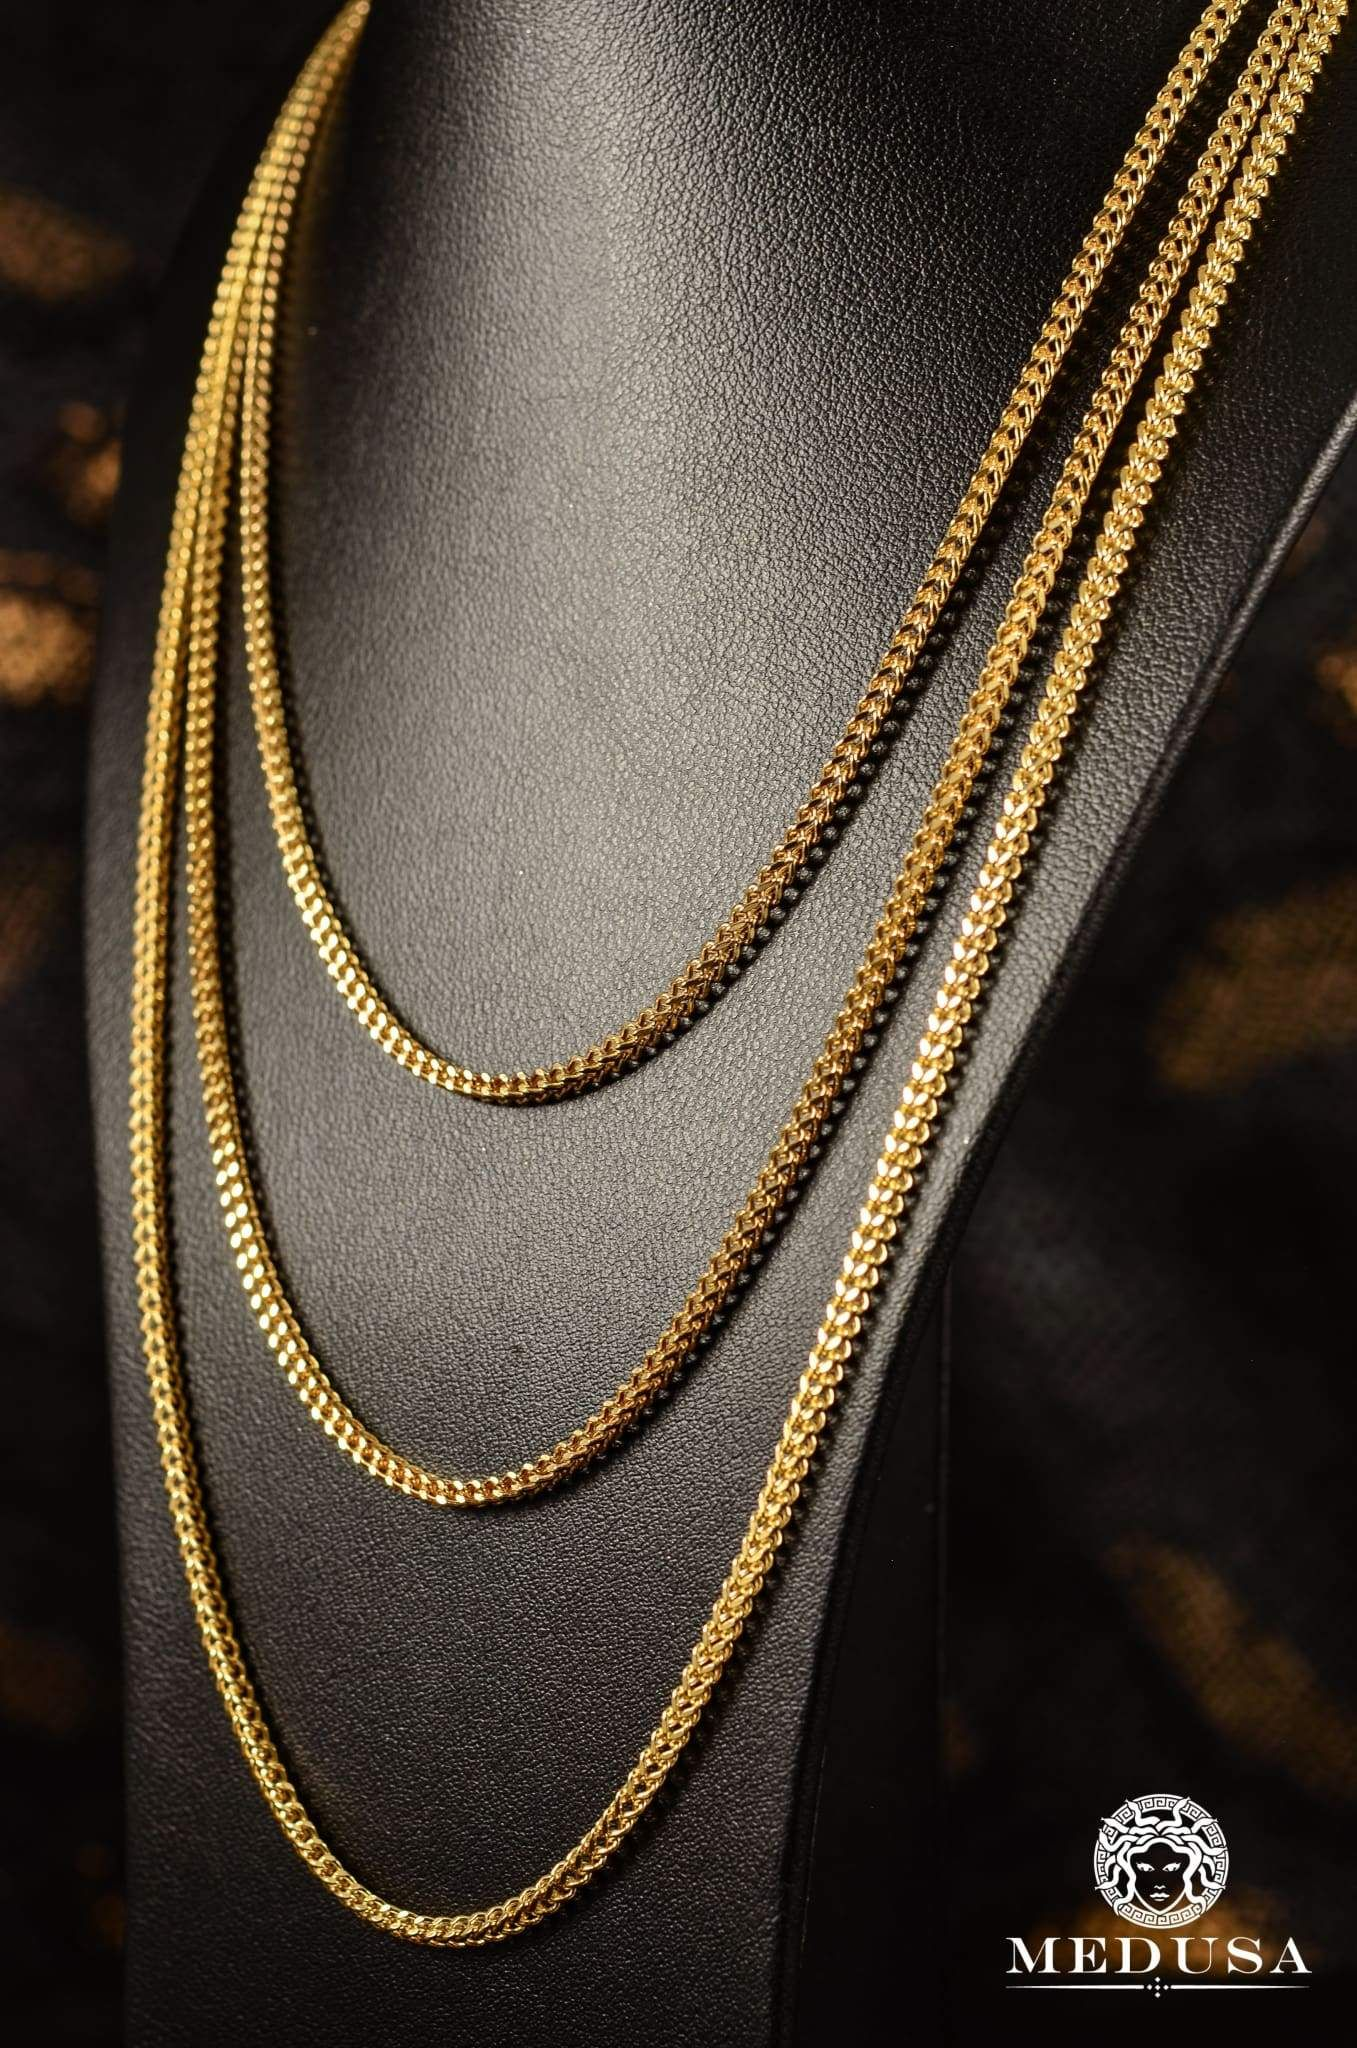 2mm Franco Gold Chain Design Gold Chains For Men Gold Mangalsutra Designs